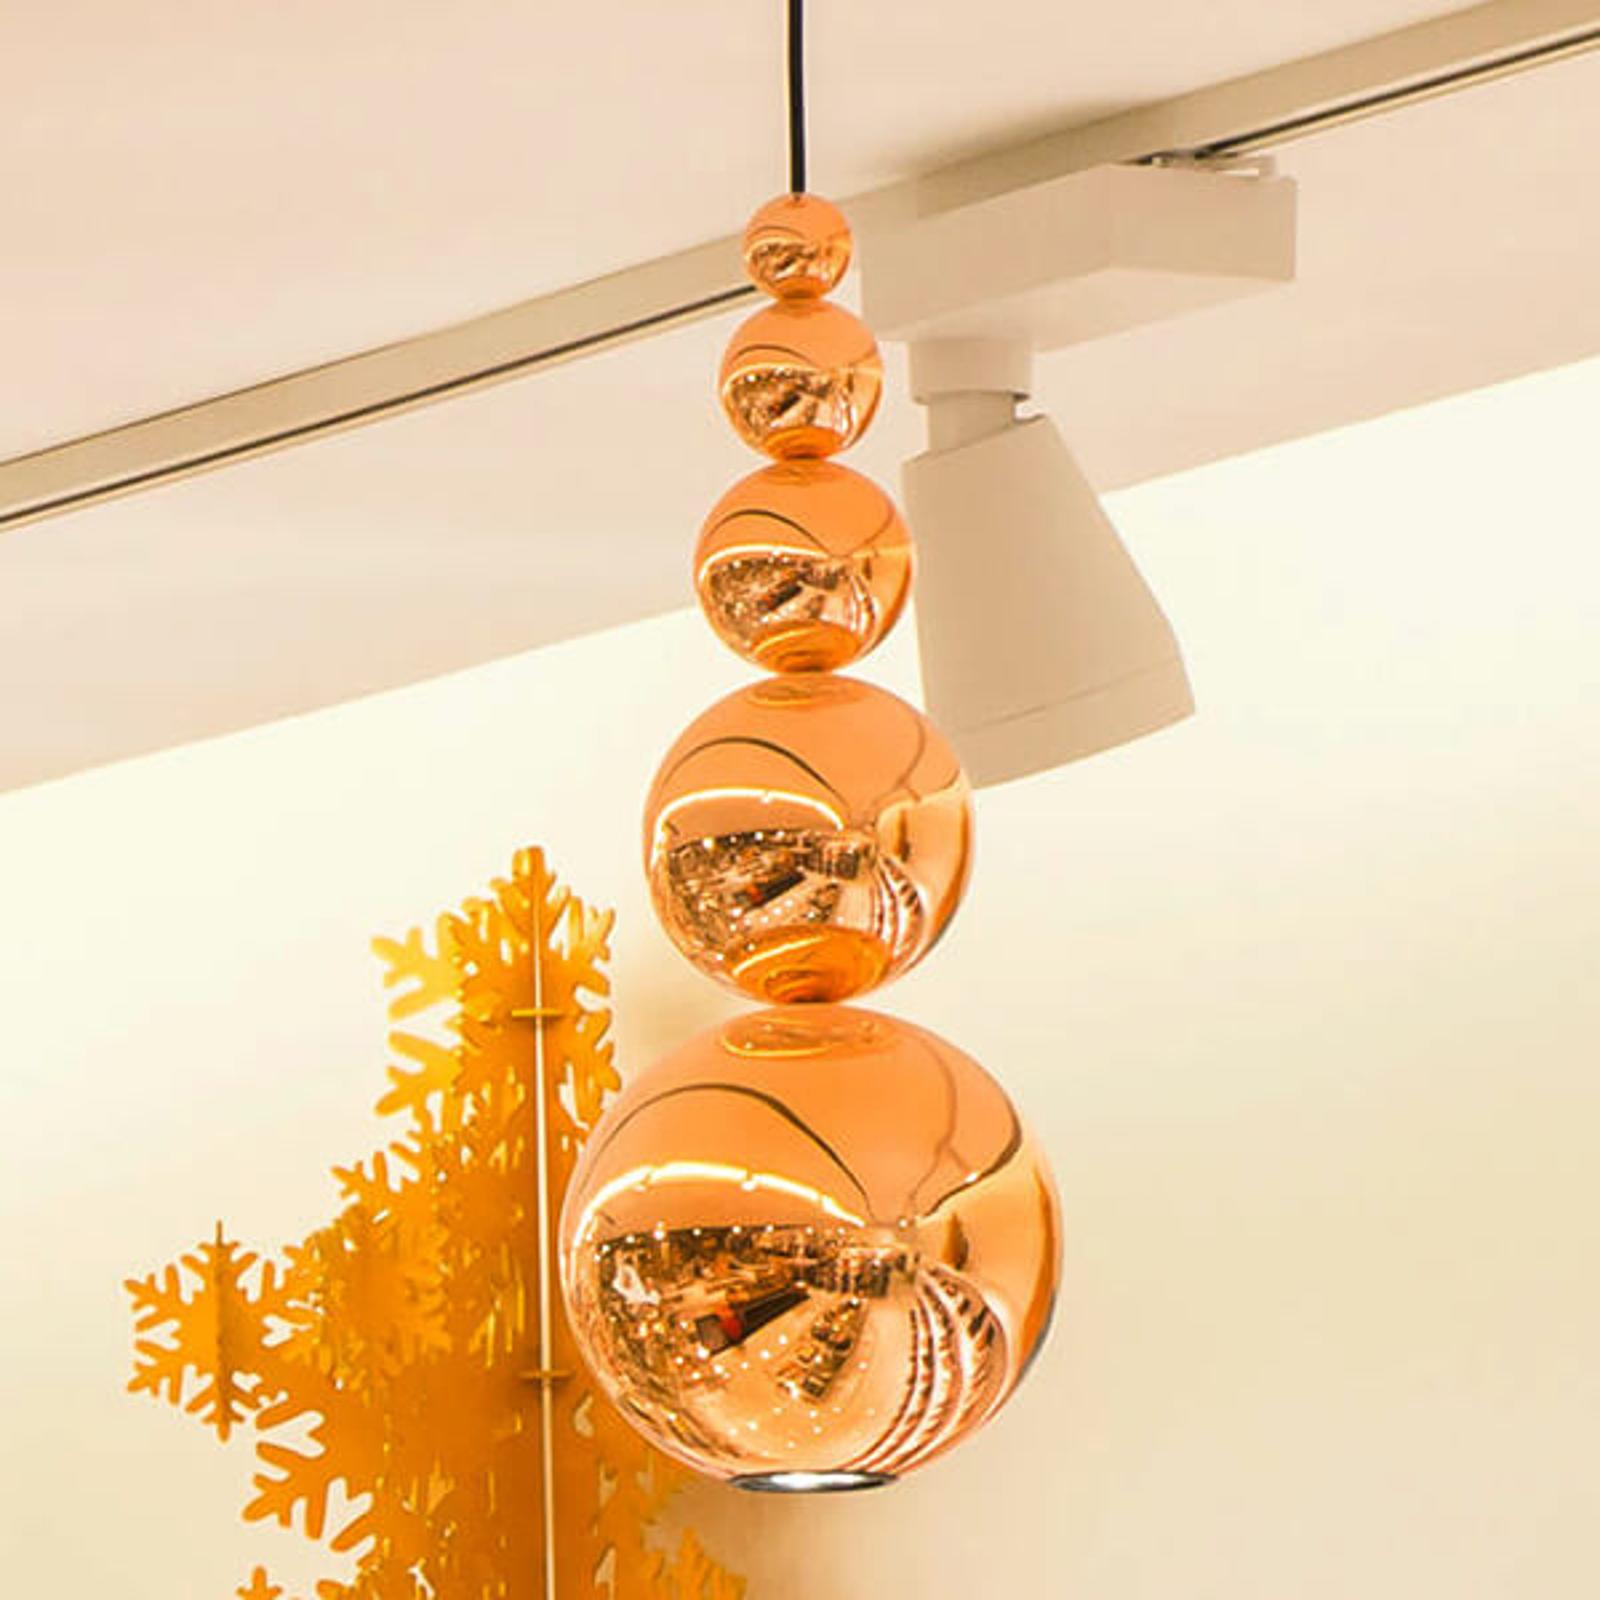 Innermost Bubble -hængelampe i kobber